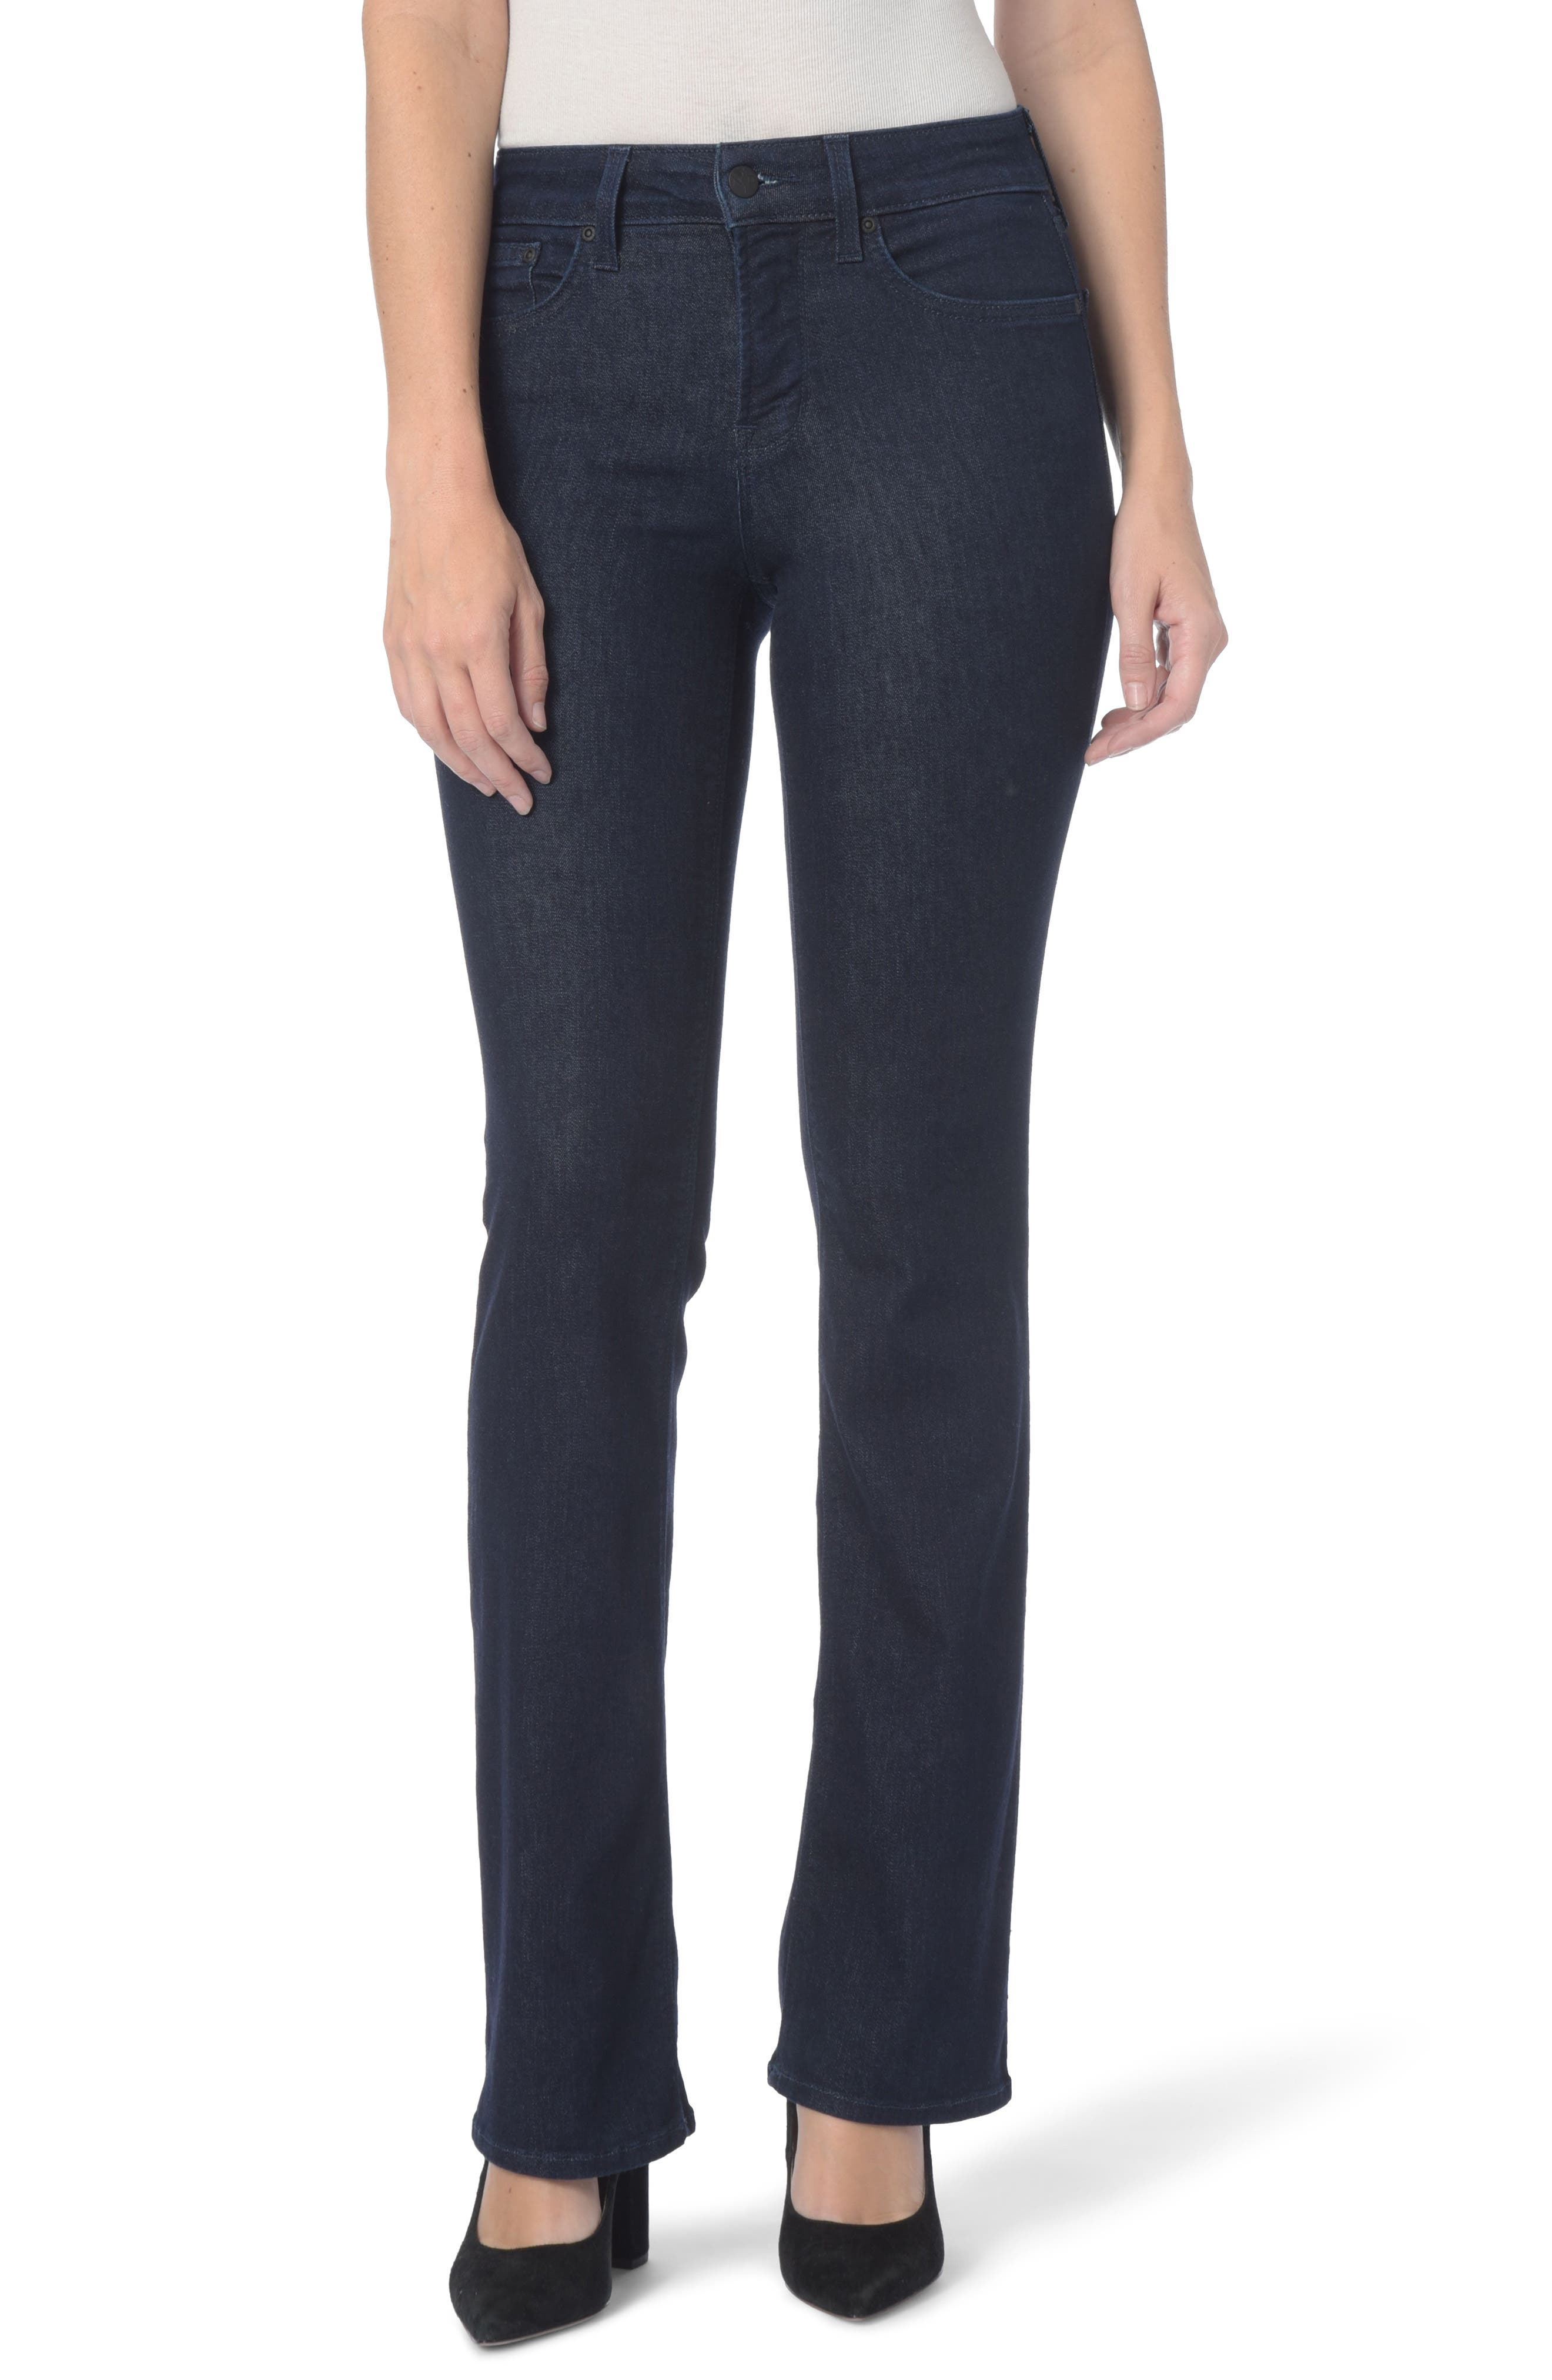 Main Image - NYDJ Barbara Stretch Bootcut Jeans (Regular & Petite)